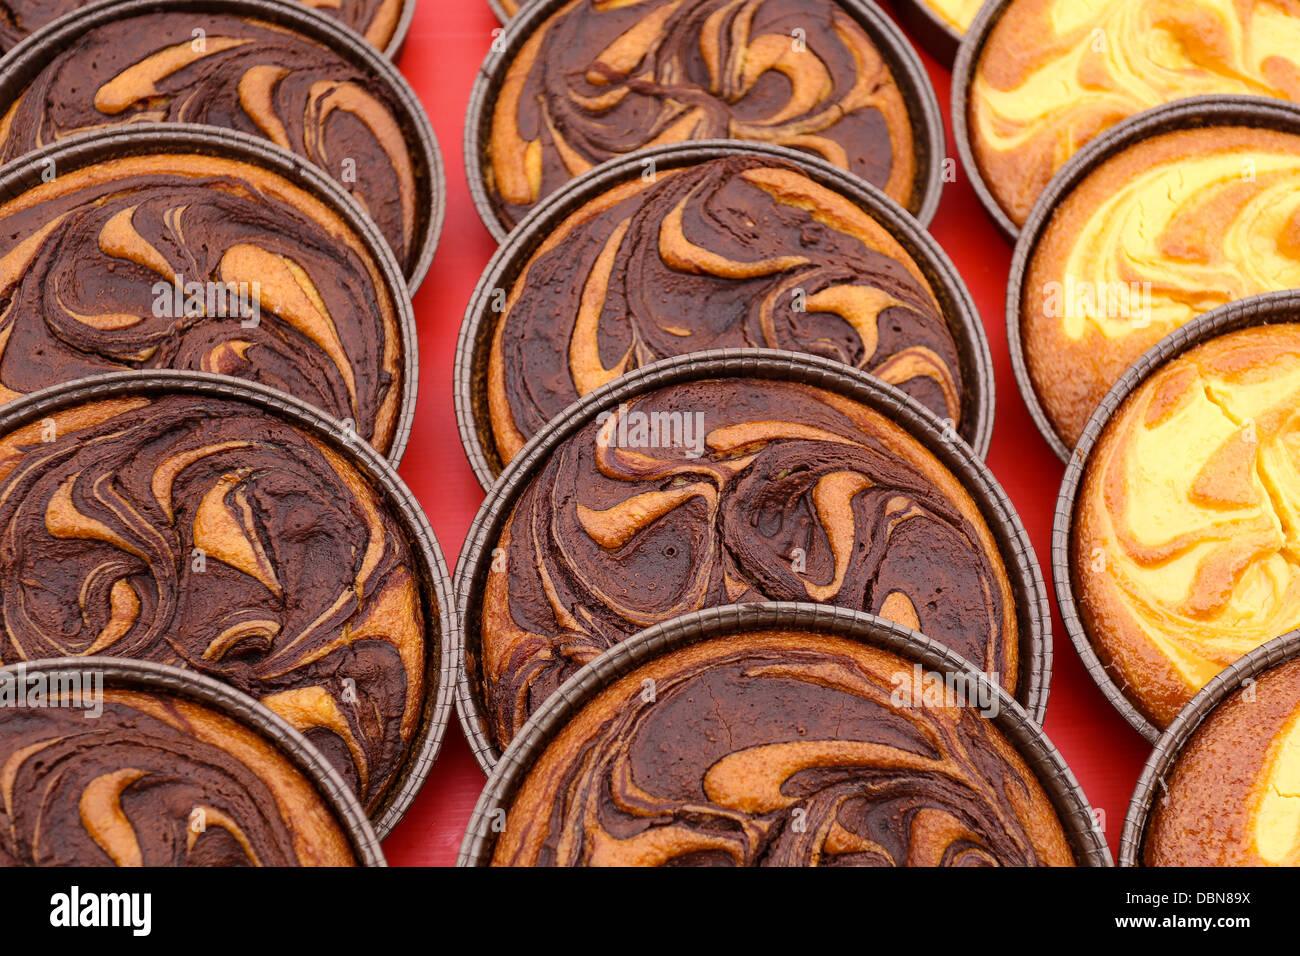 Chocolate tarts and Custard cream tarts on display - Stock Image